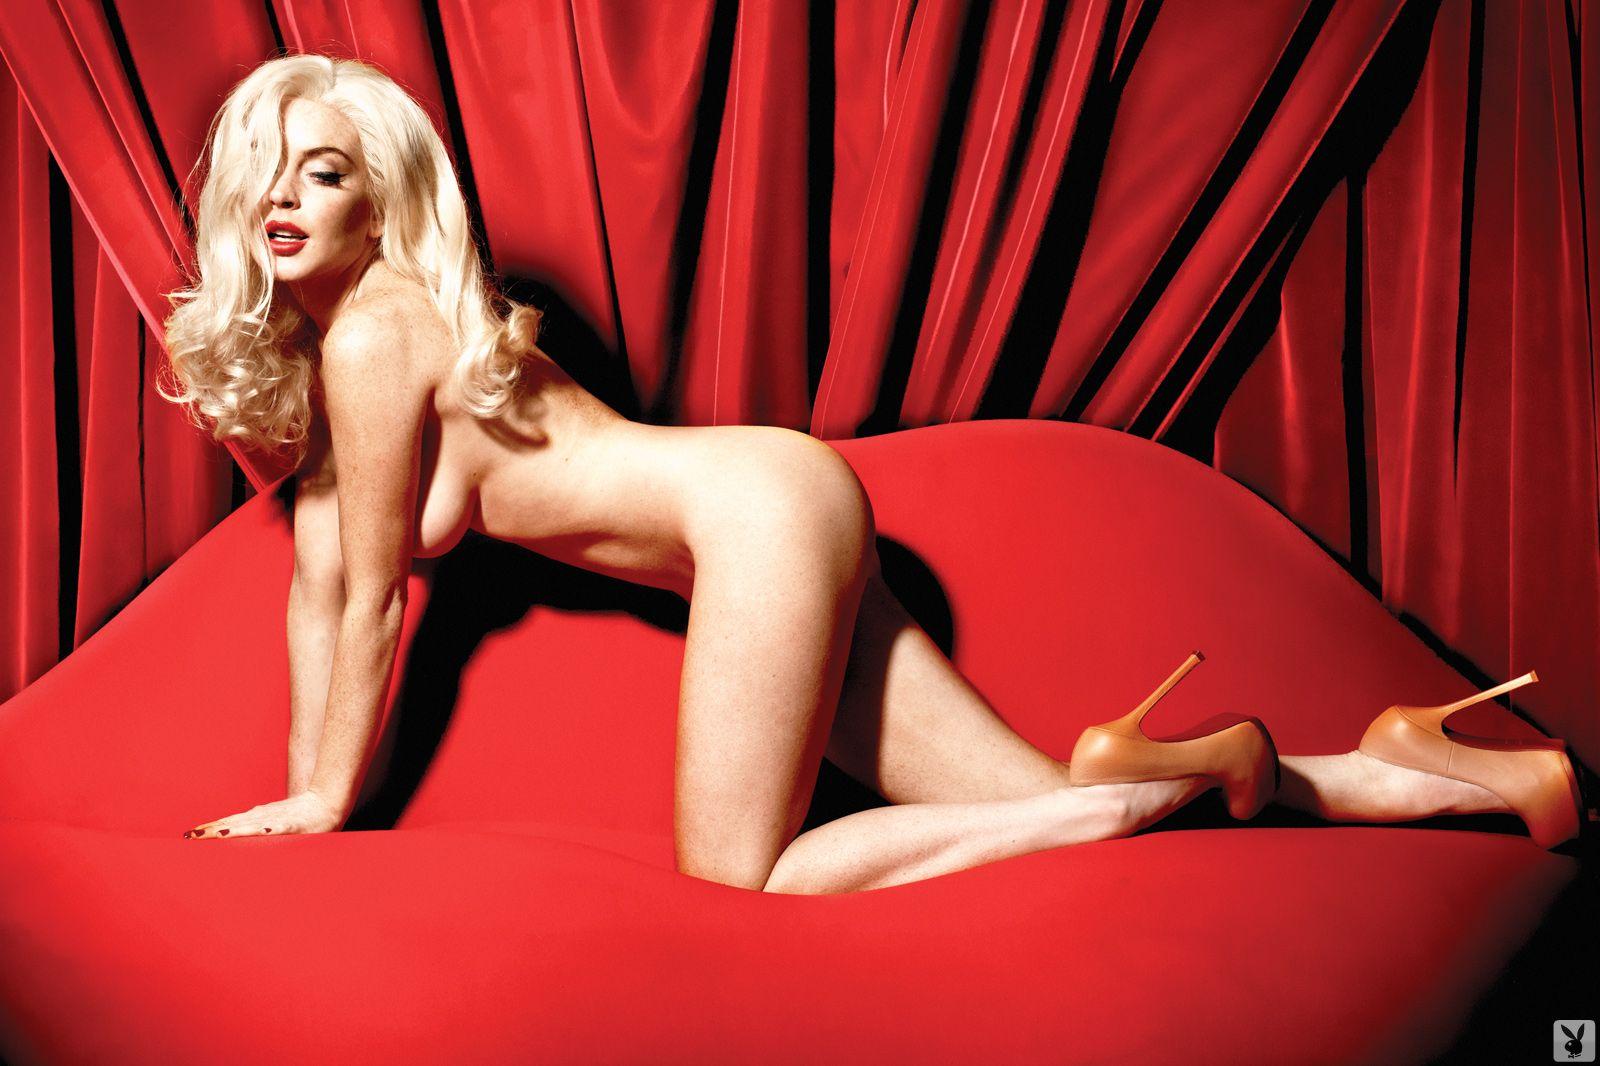 Jewish lindsay lohan naked nude jeans nude pussy